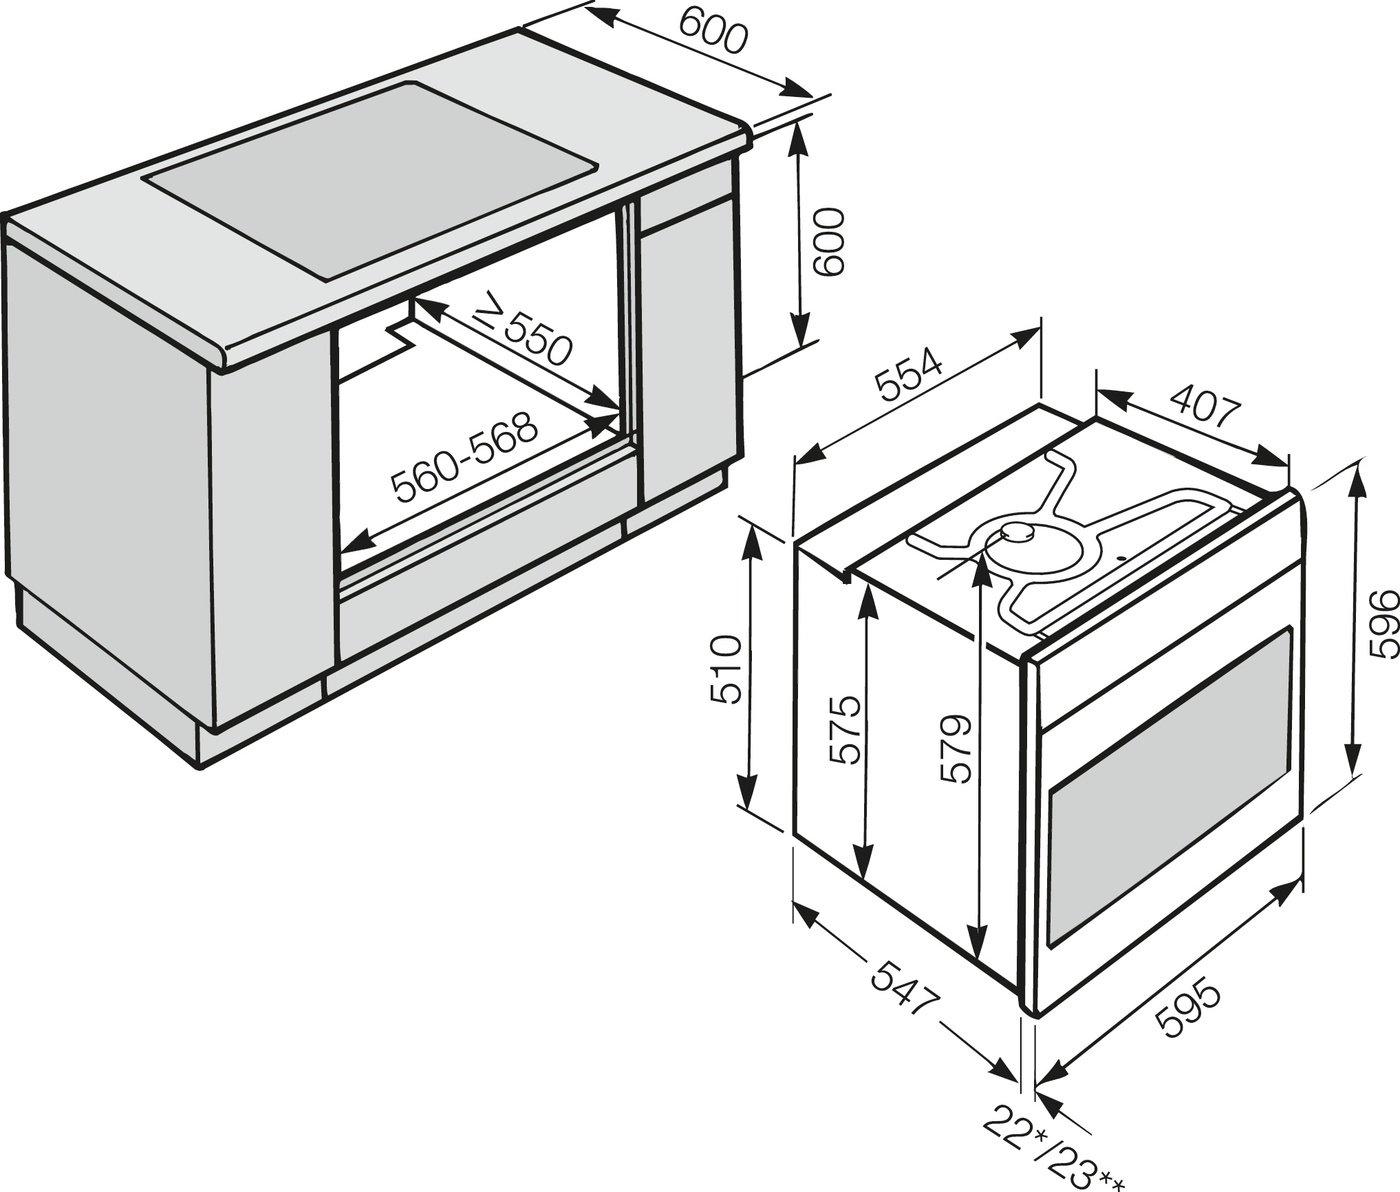 55.4 cm Glaskeramik Breite Herdset aus Miele H 2267 E Active Herd edelstahl und LPT Elektro-Kochfeld 57.4 cm